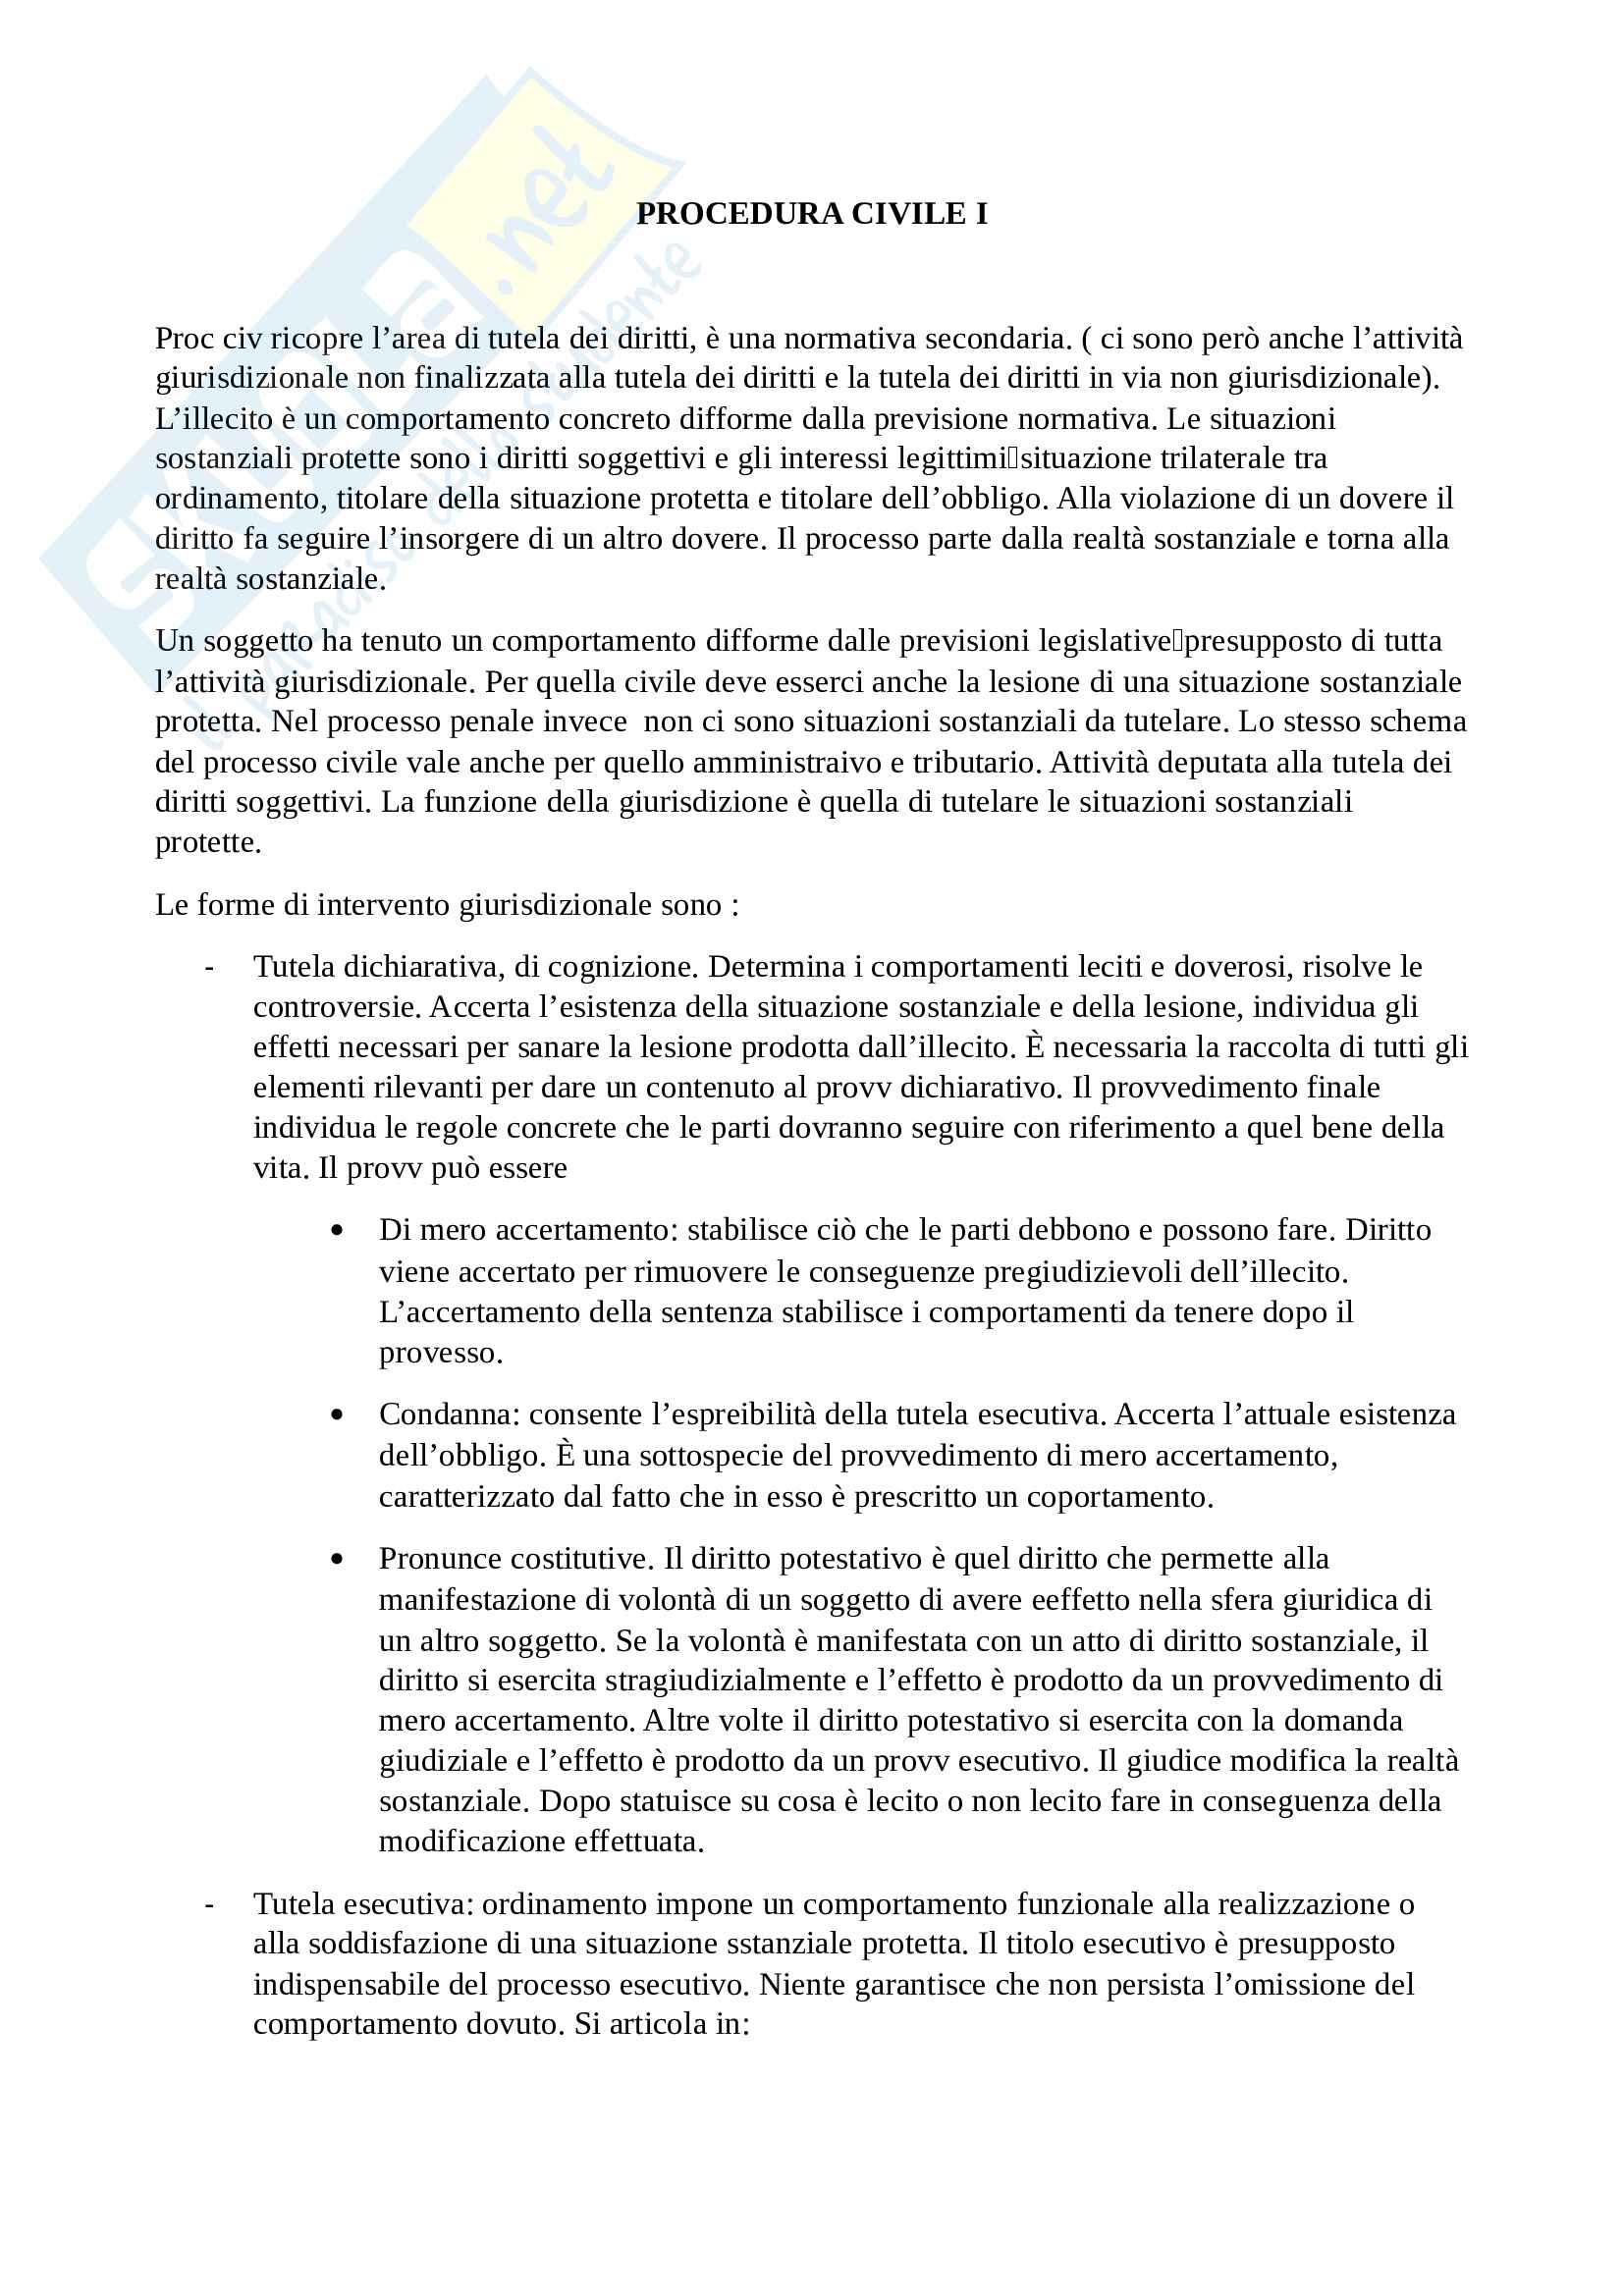 Procedura Civile I - schemi